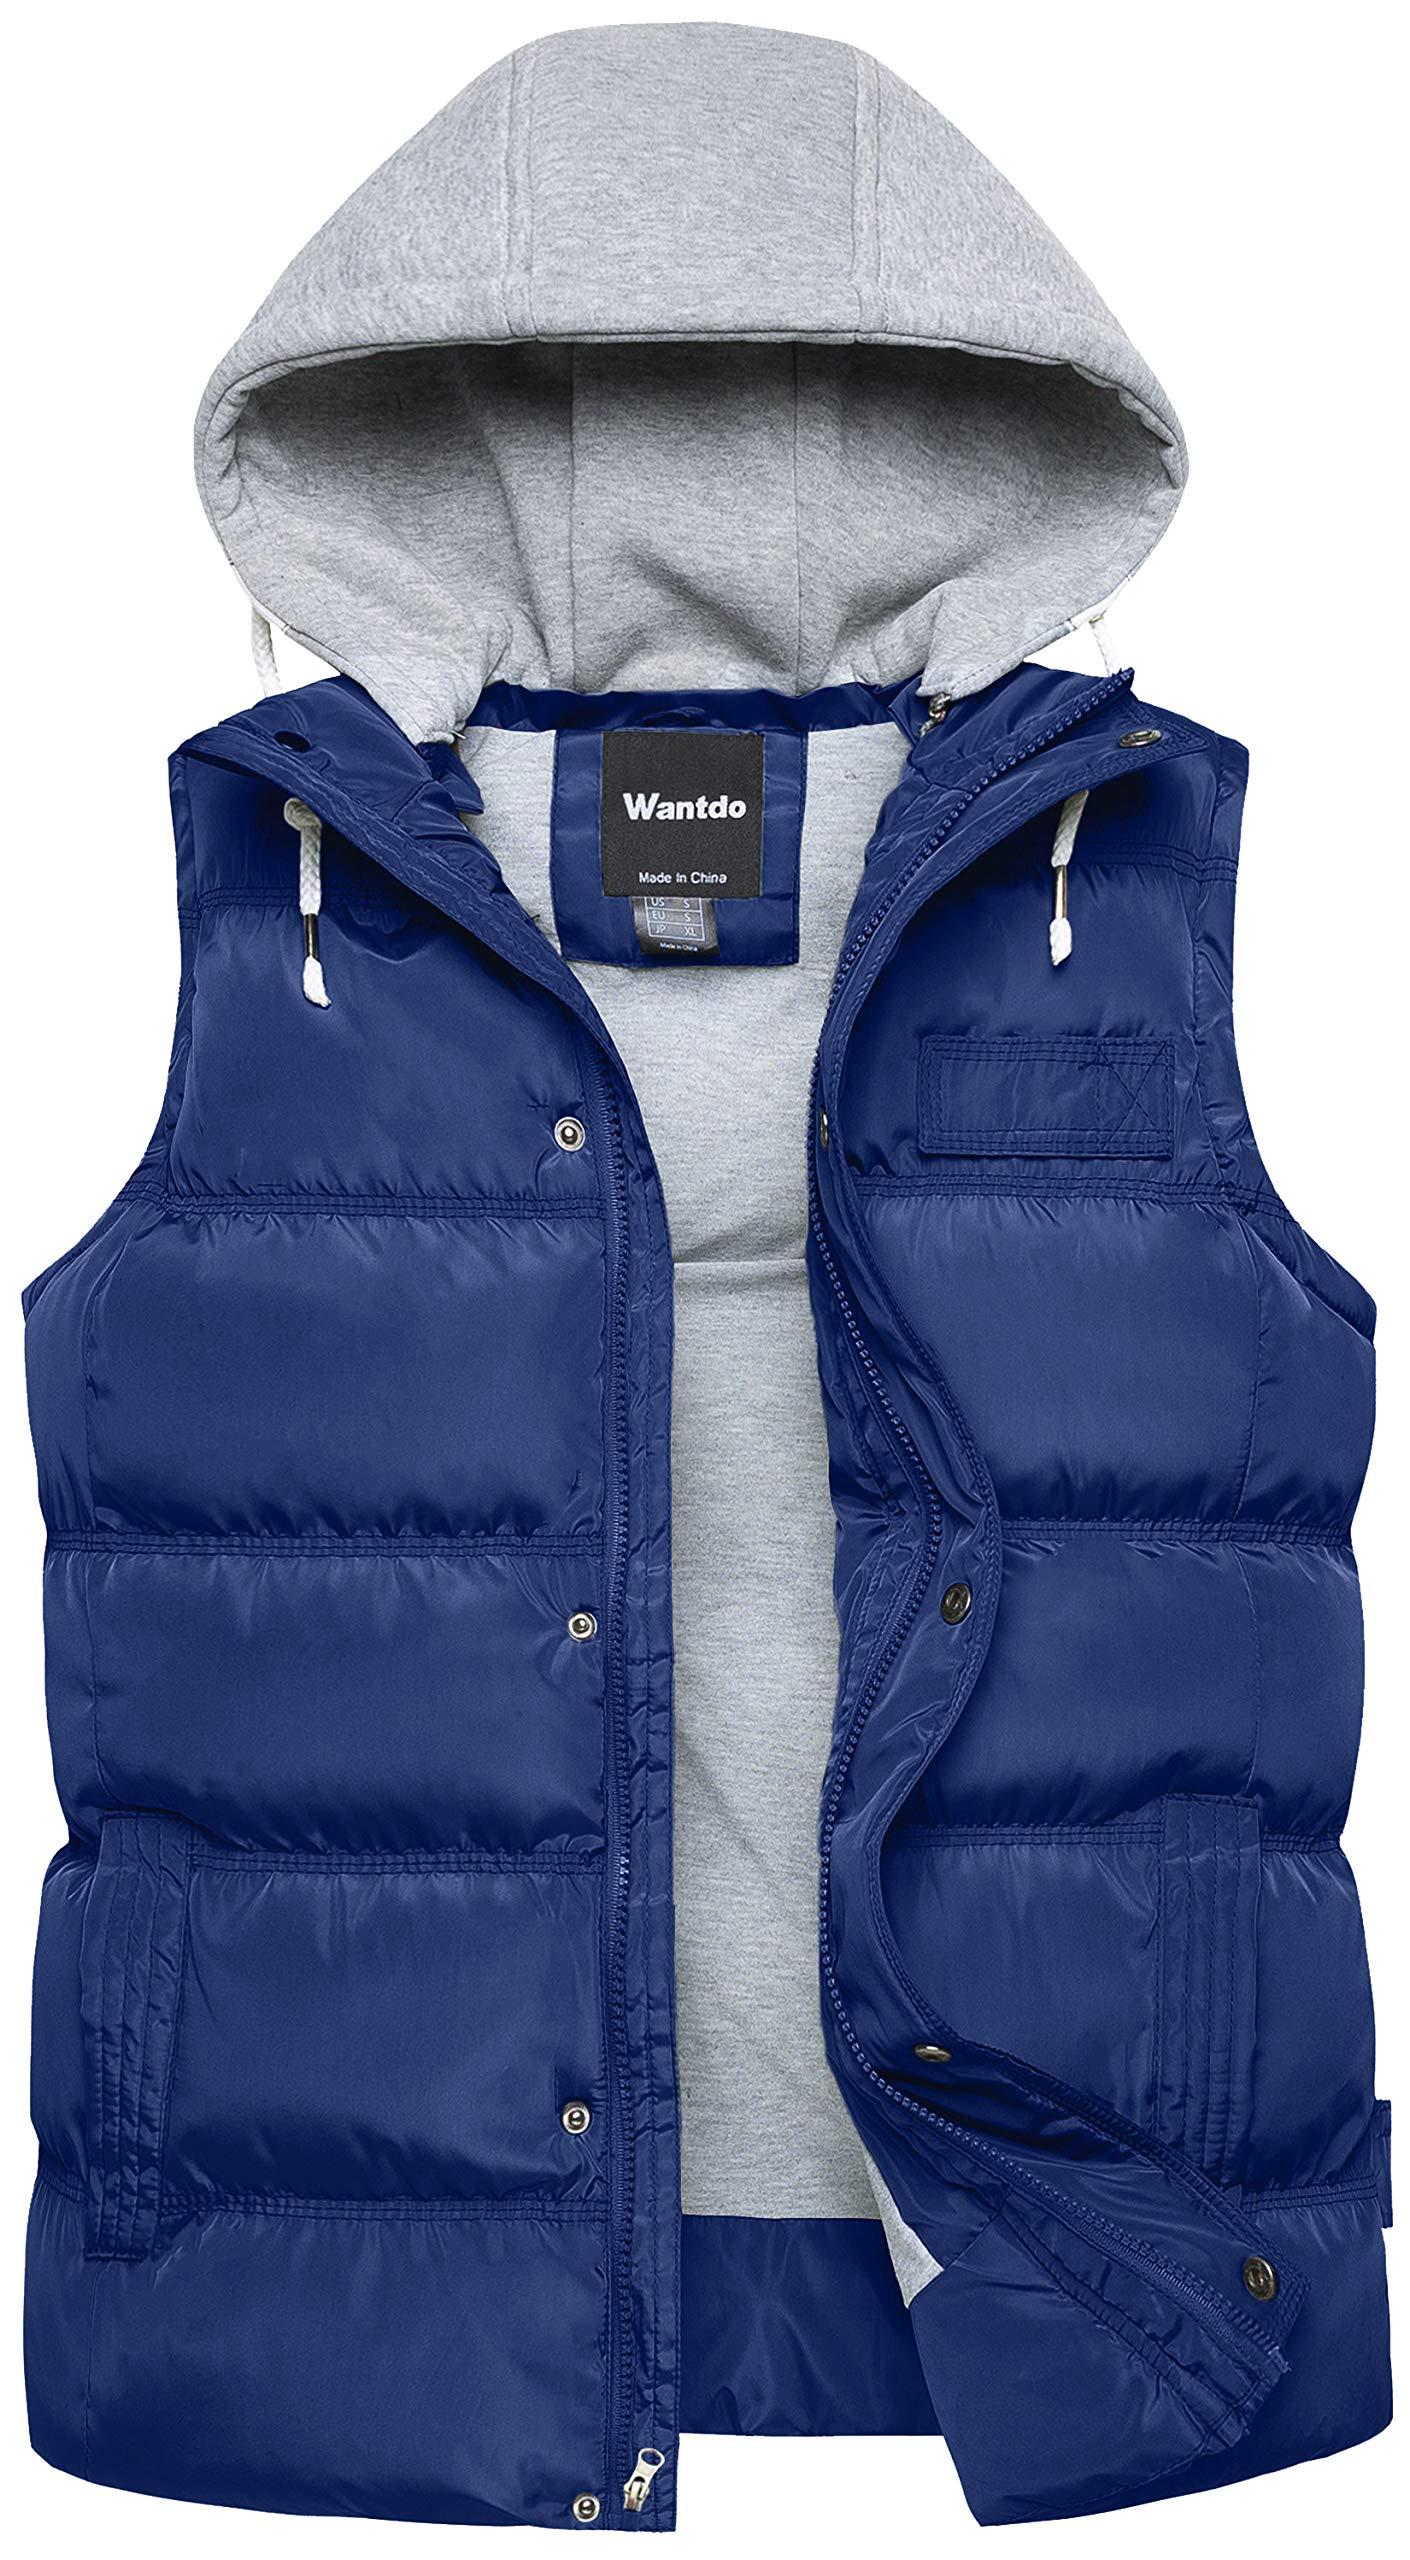 Wantdo Men's Winter Puffer Vest Quilted Warm Sleeveless Jacket Gilet Blue 2XL by Wantdo